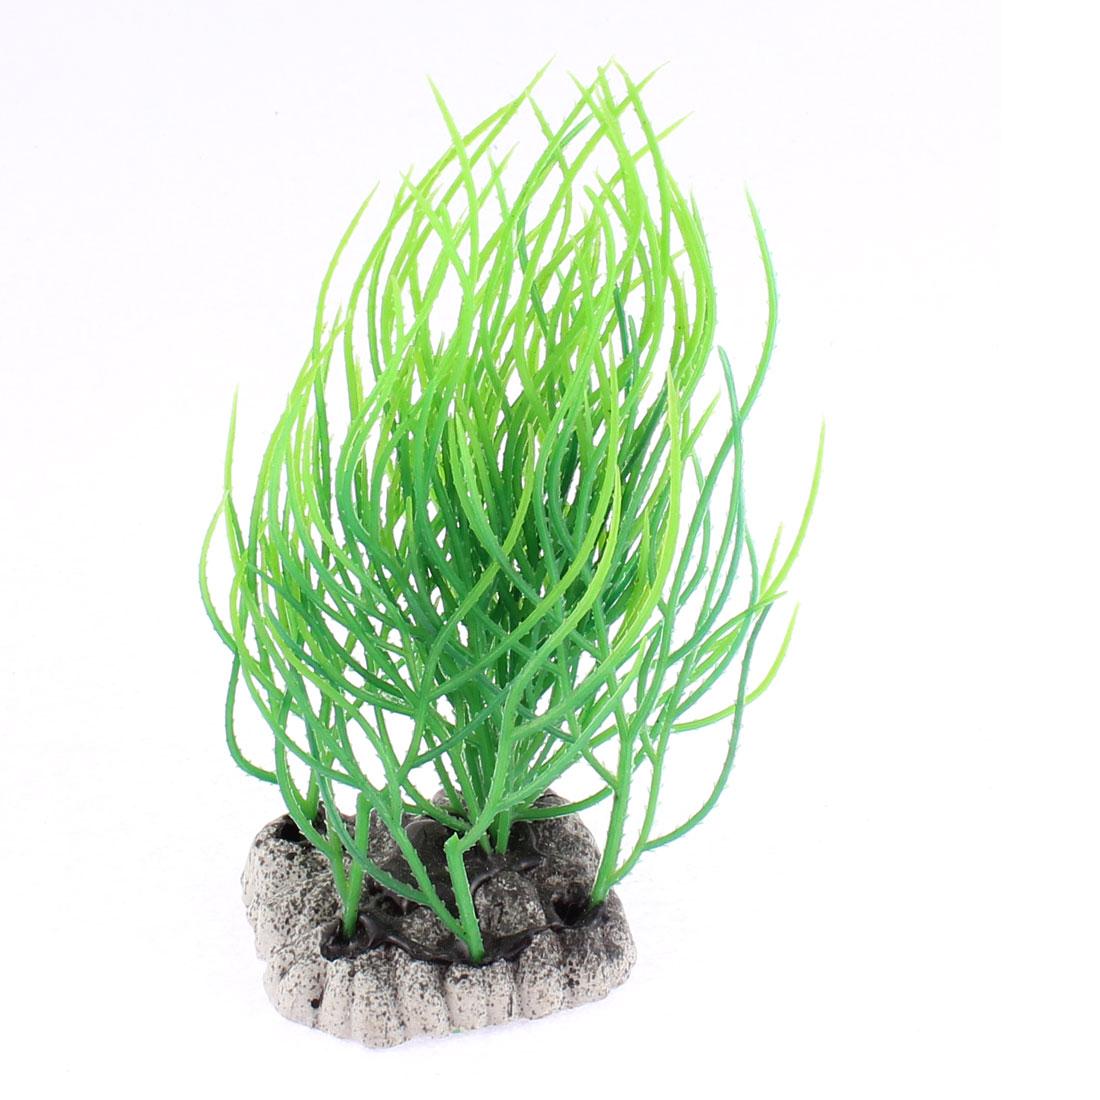 Fish Tank Aquarium Plastic Artificial Plant Landscape Underwater Grass Ornament